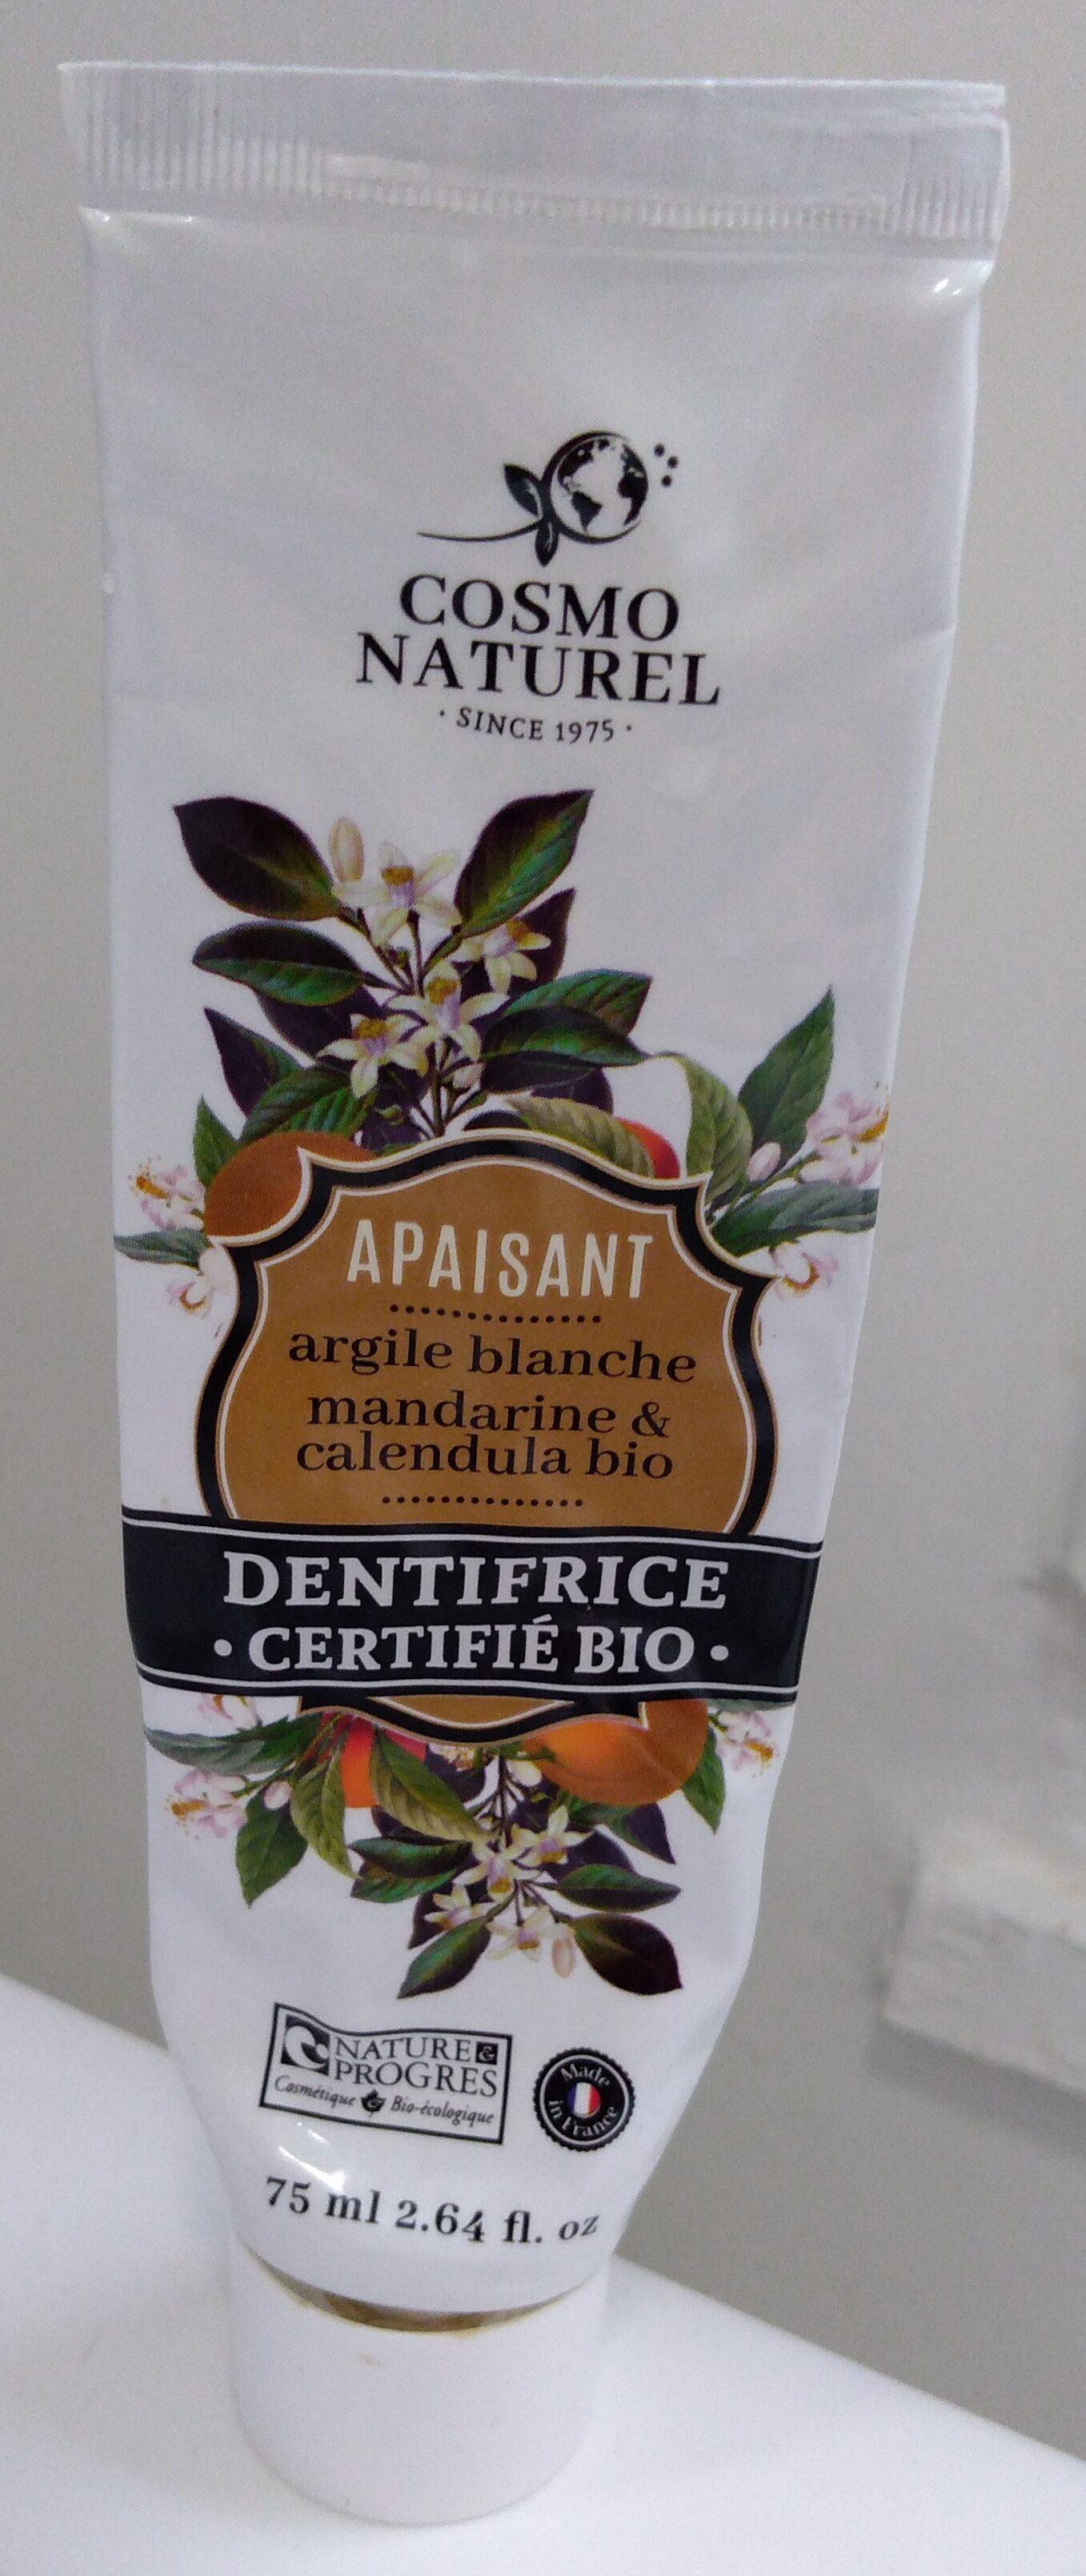 Dentifrice argile blanche mandarine & calendula bio - Product - fr